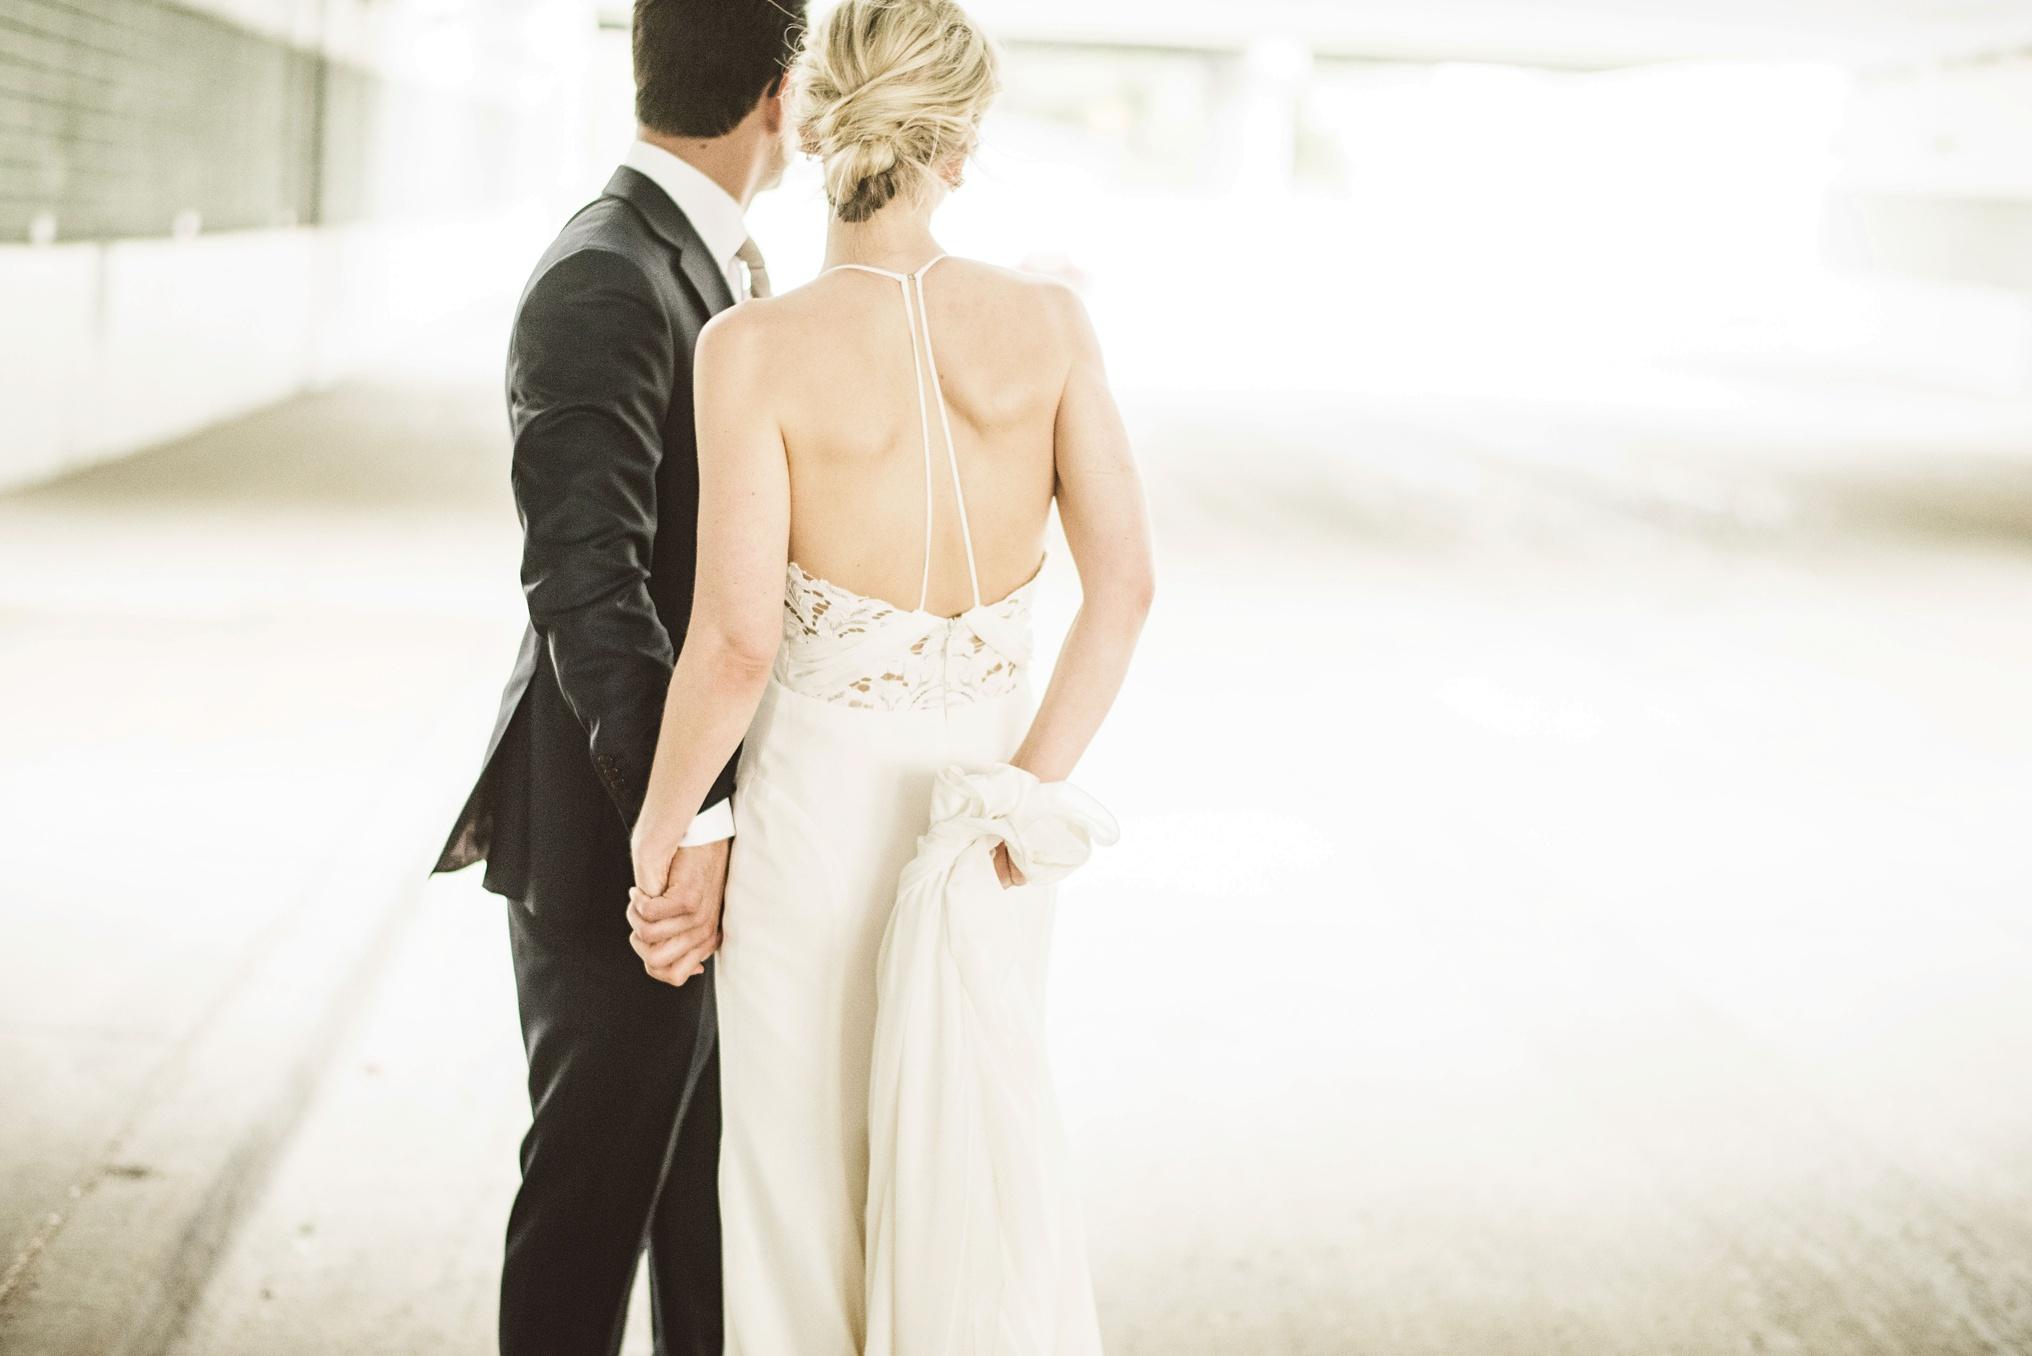 best_wedding_photography_2017_by_lucas_botz_photography_009.jpg